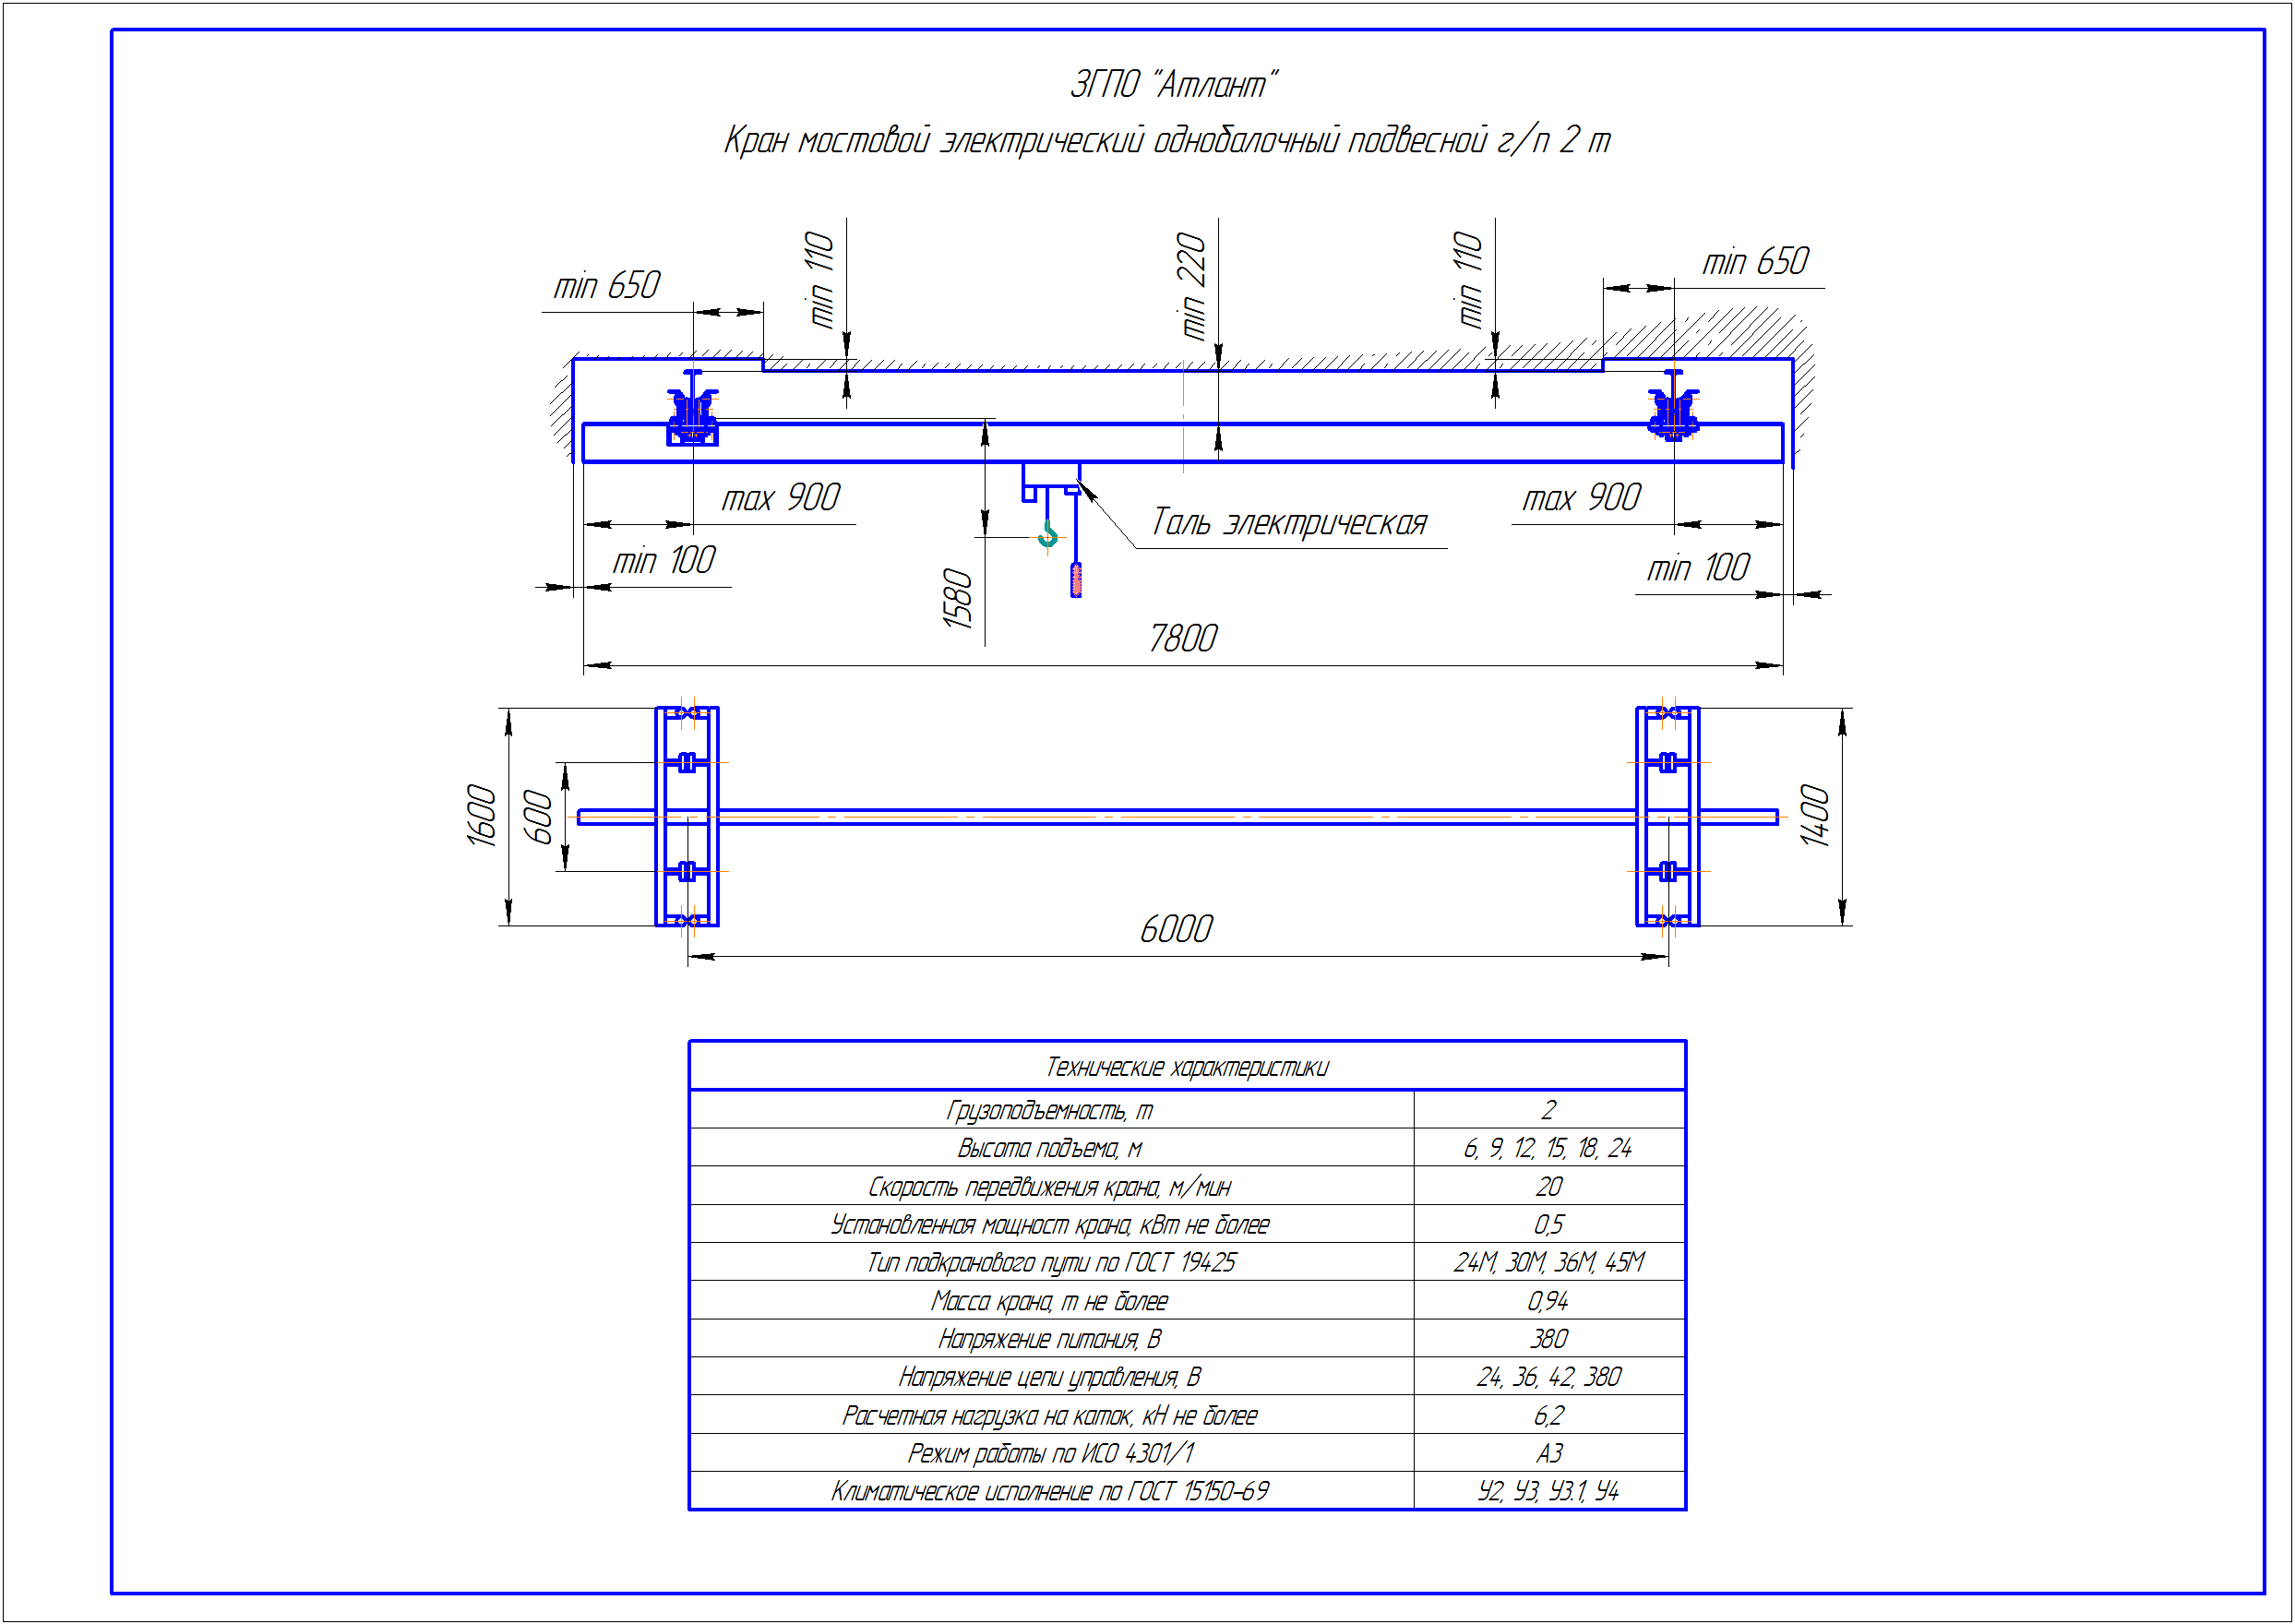 KBP 2 2 - Подвесная кран балка